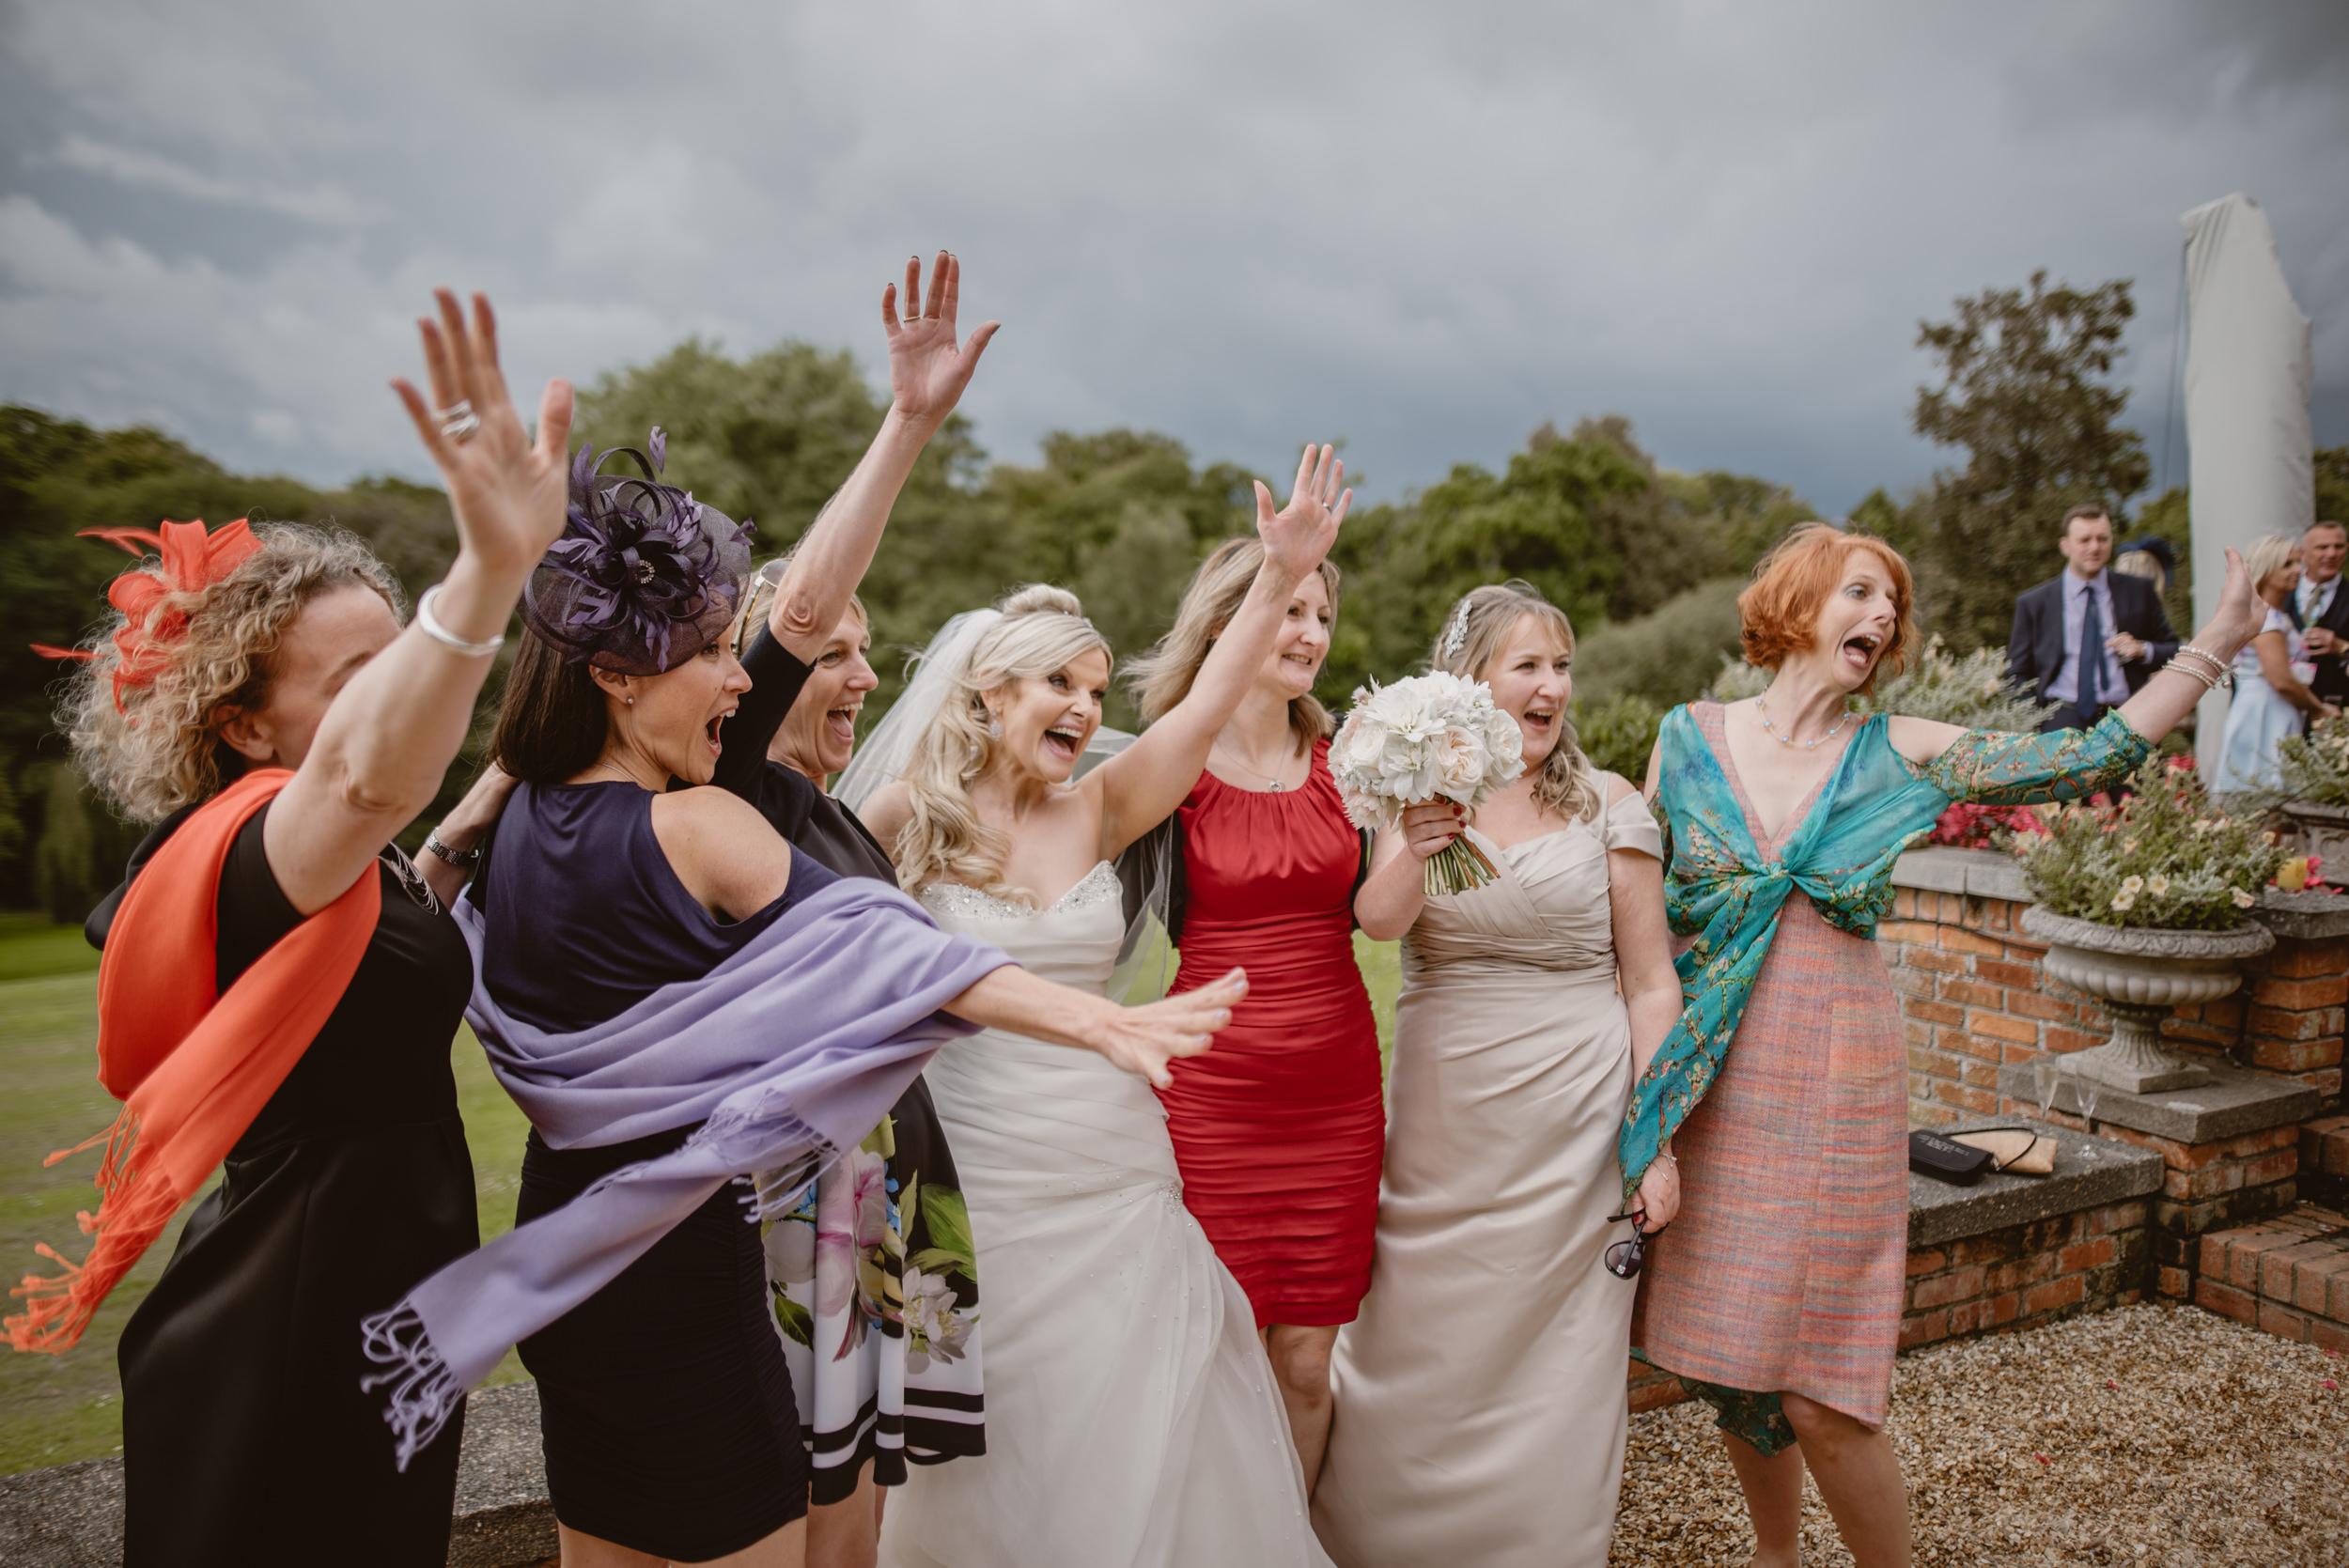 Trisha-and-Roger-wedding-The-Priory-Church-and-Chewton-Glen-Hotel-Christchurch-Manu-Mendoza-Wedding-Photography-351.jpg